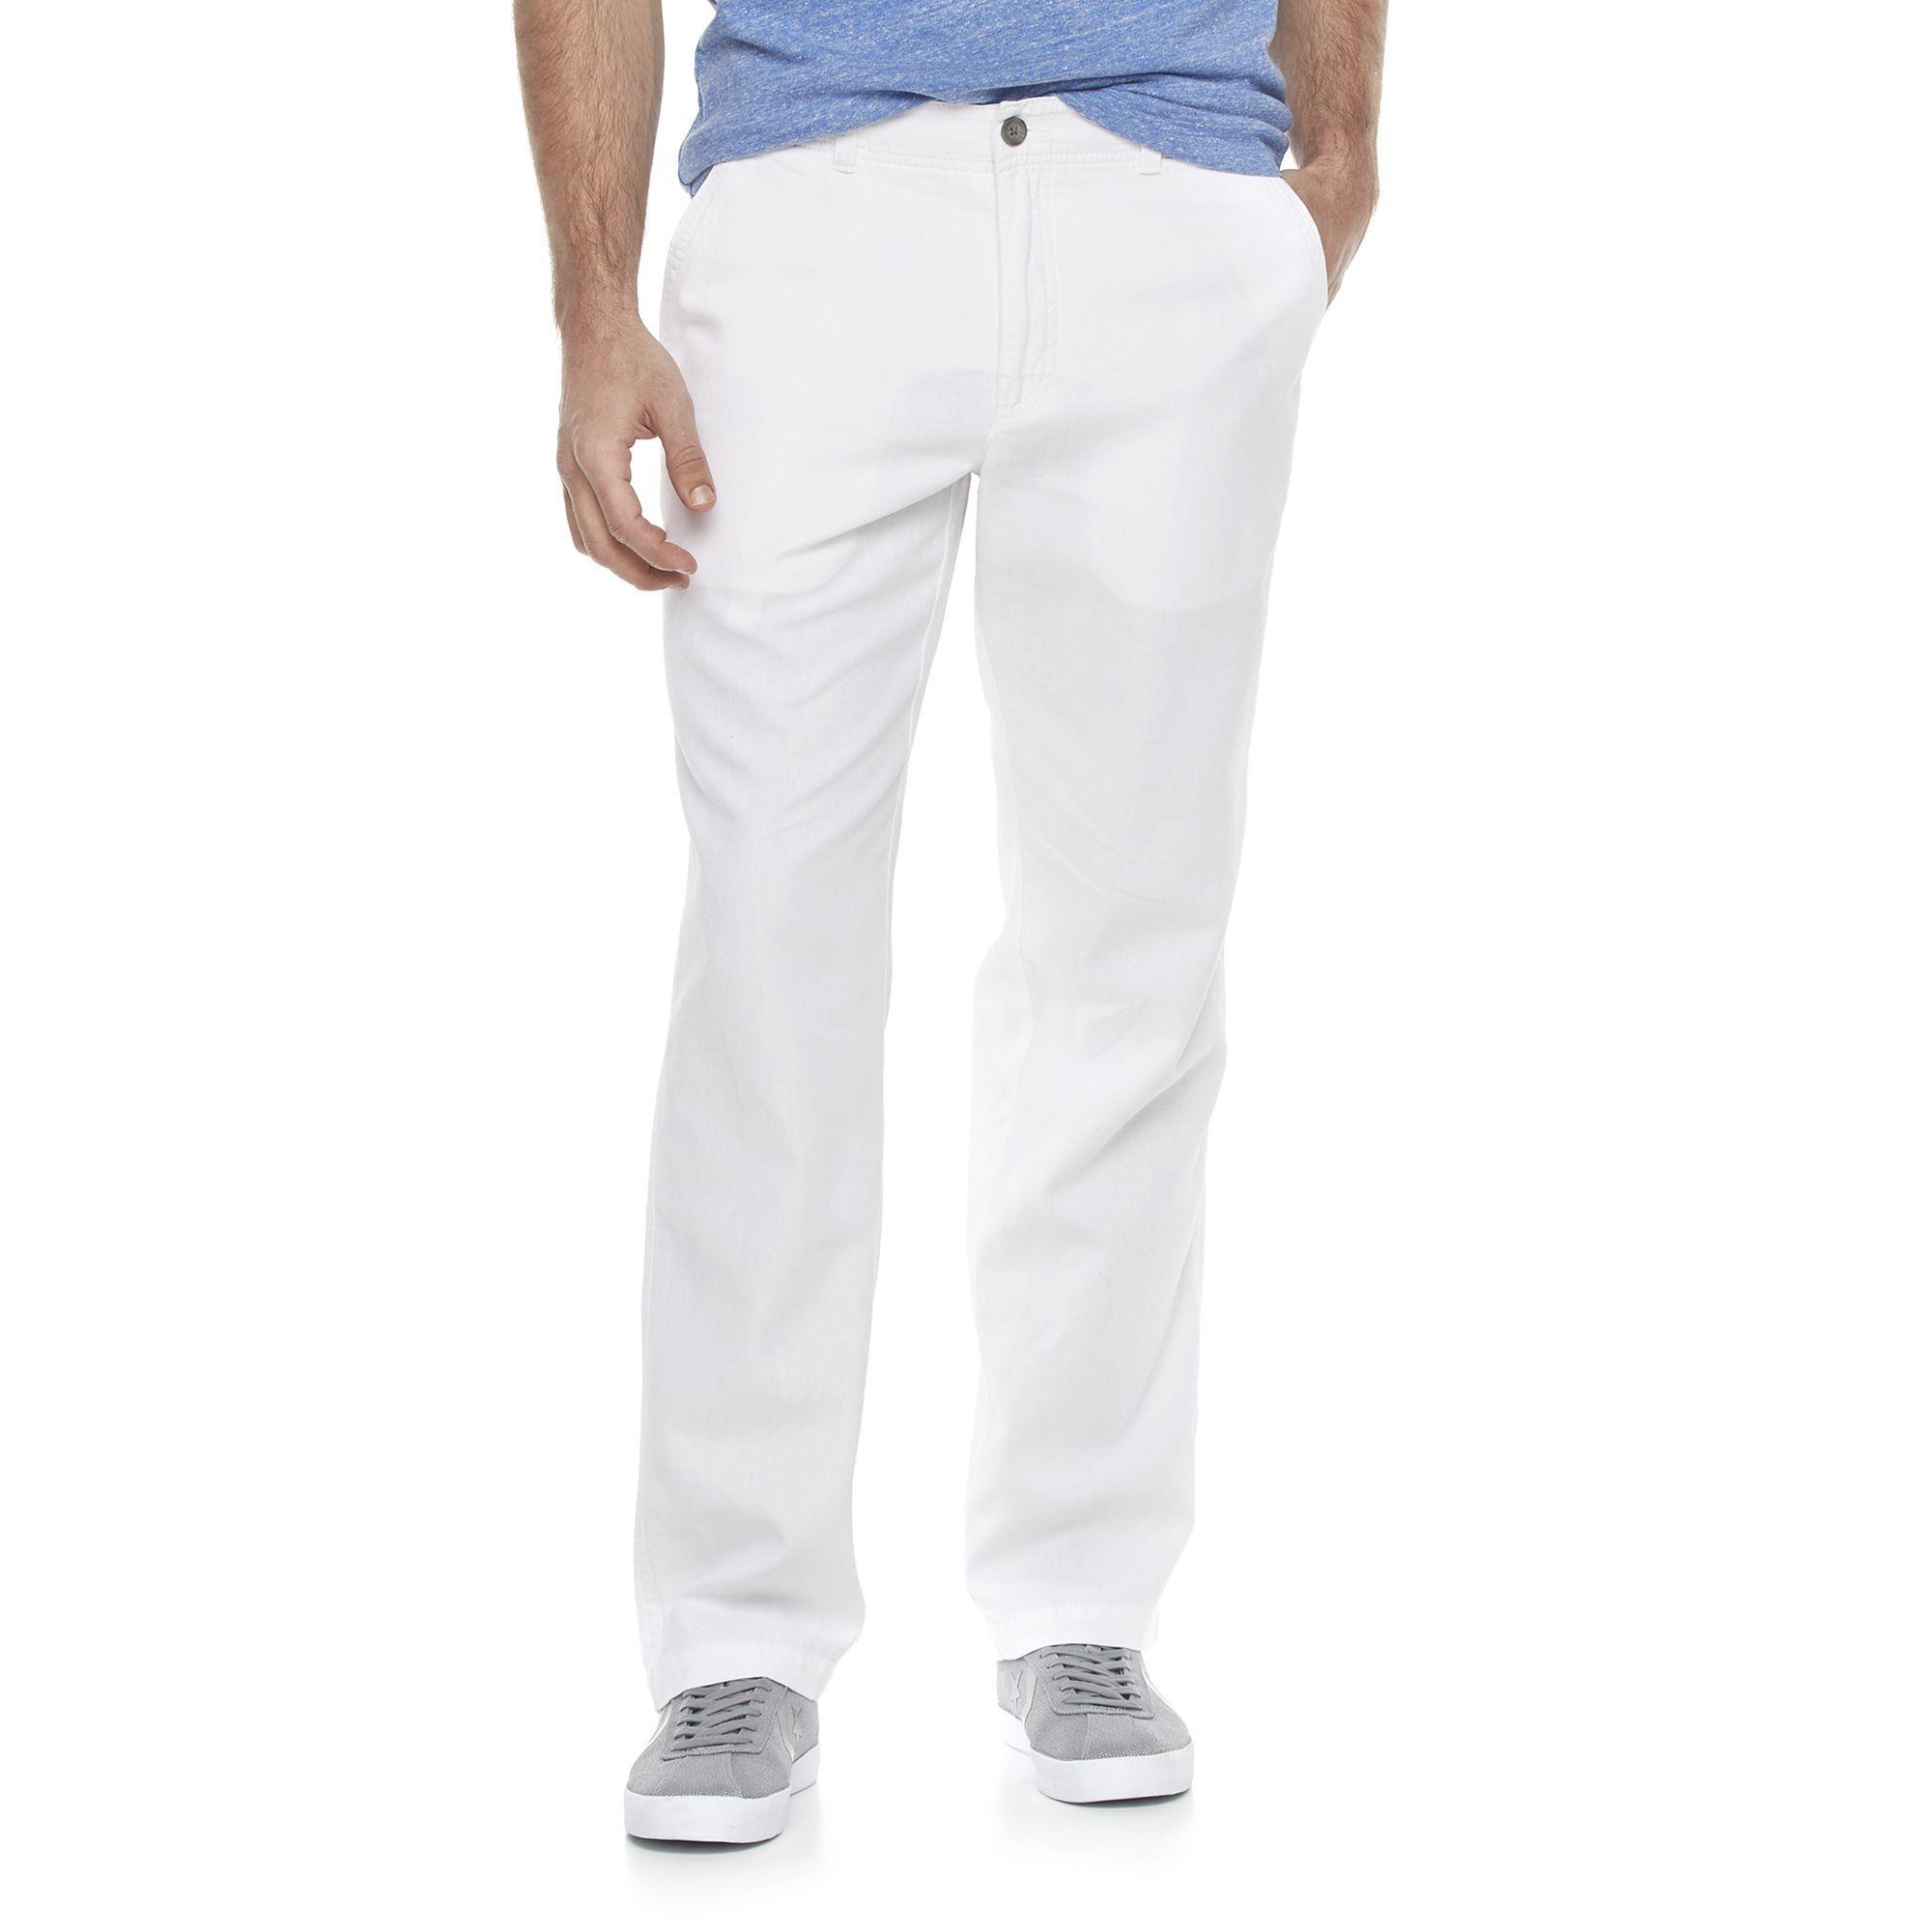 e86d8f73f4a8d7 Men's Marc Anthony Slim-Fit Linen-Blend Pants | Products | Pants ...